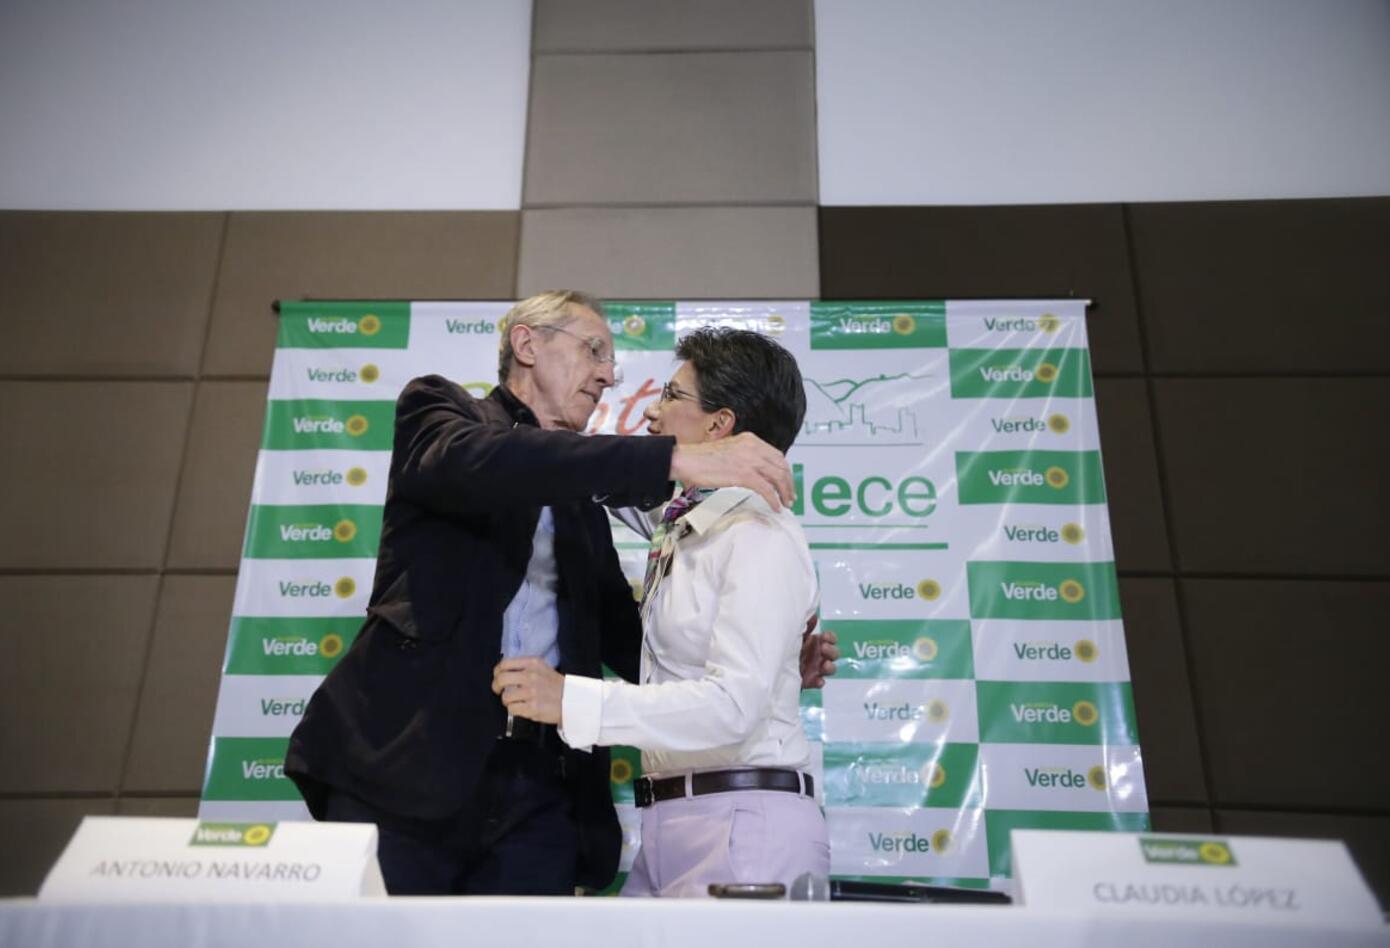 Claudia López, candidata oficial de Alianza Verde para Alcaldía de Bogotá